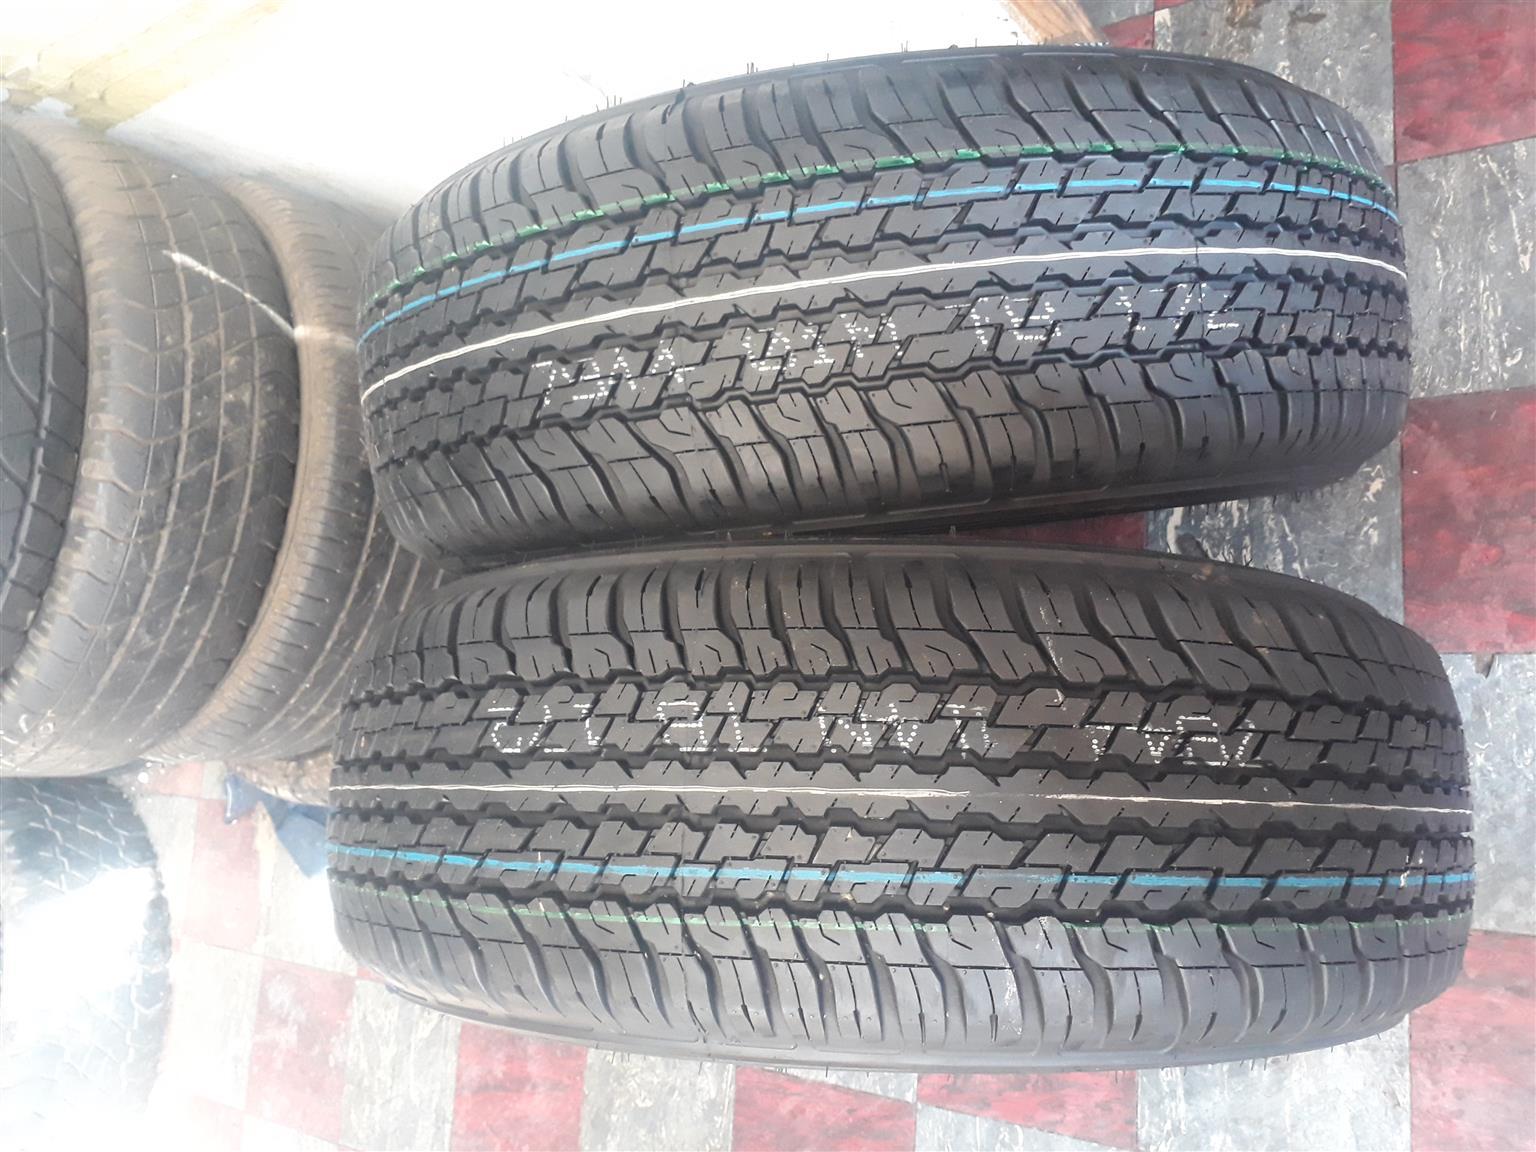 265 / 65 / 17 Dunlop A / T tyres